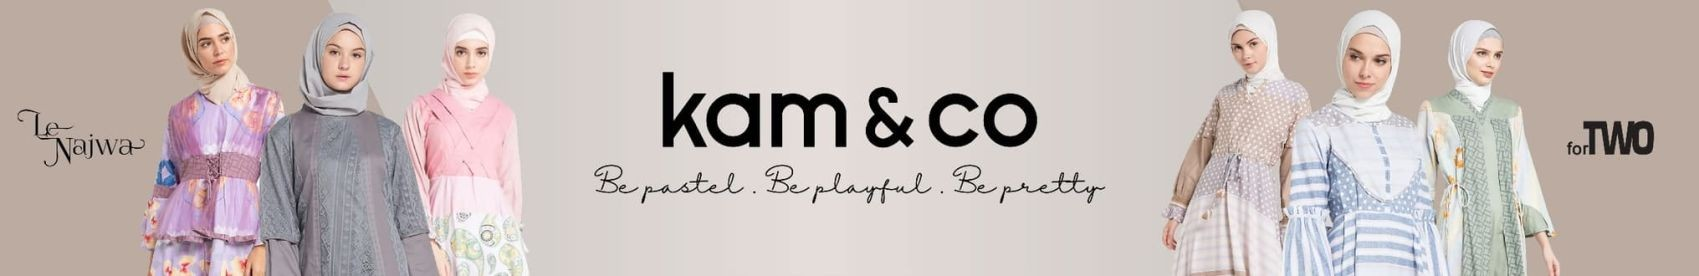 Kam & Co